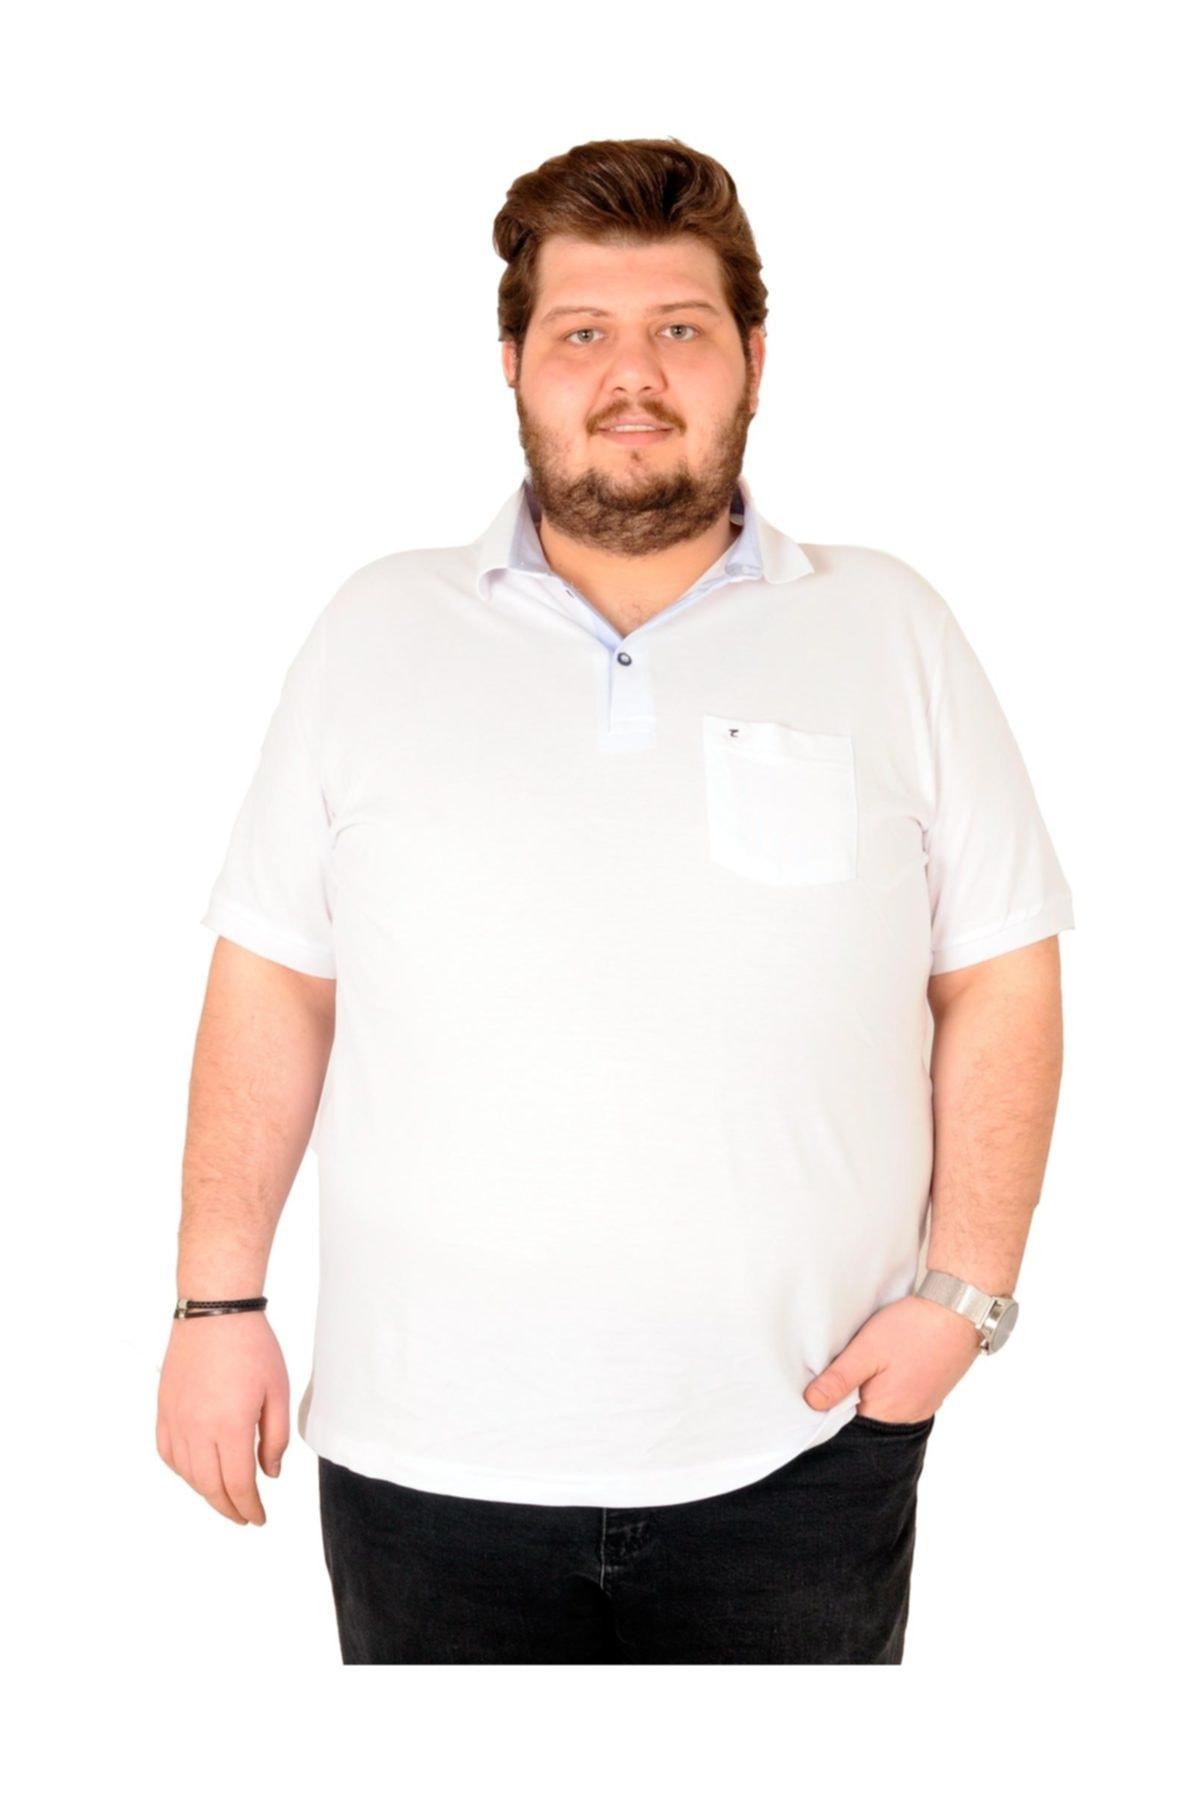 ModeXL T-shirt Polo Yaka Cepli Klasik Beyaz 1